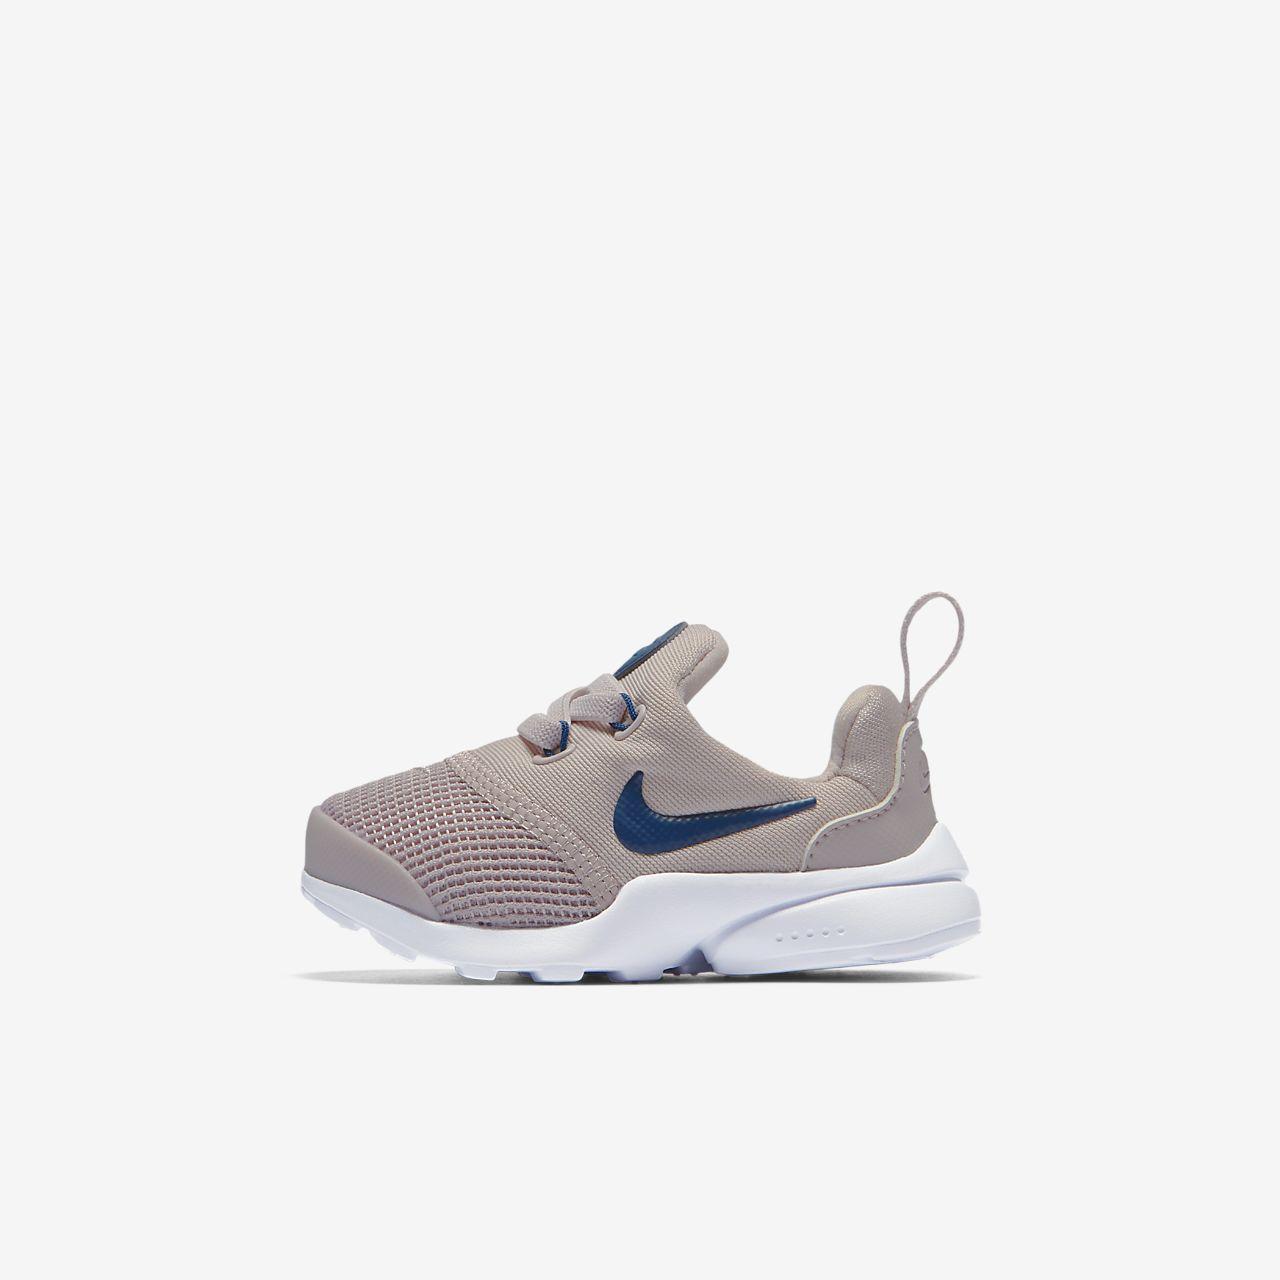 ... Nike Presto Fly Infant/Toddler Shoe